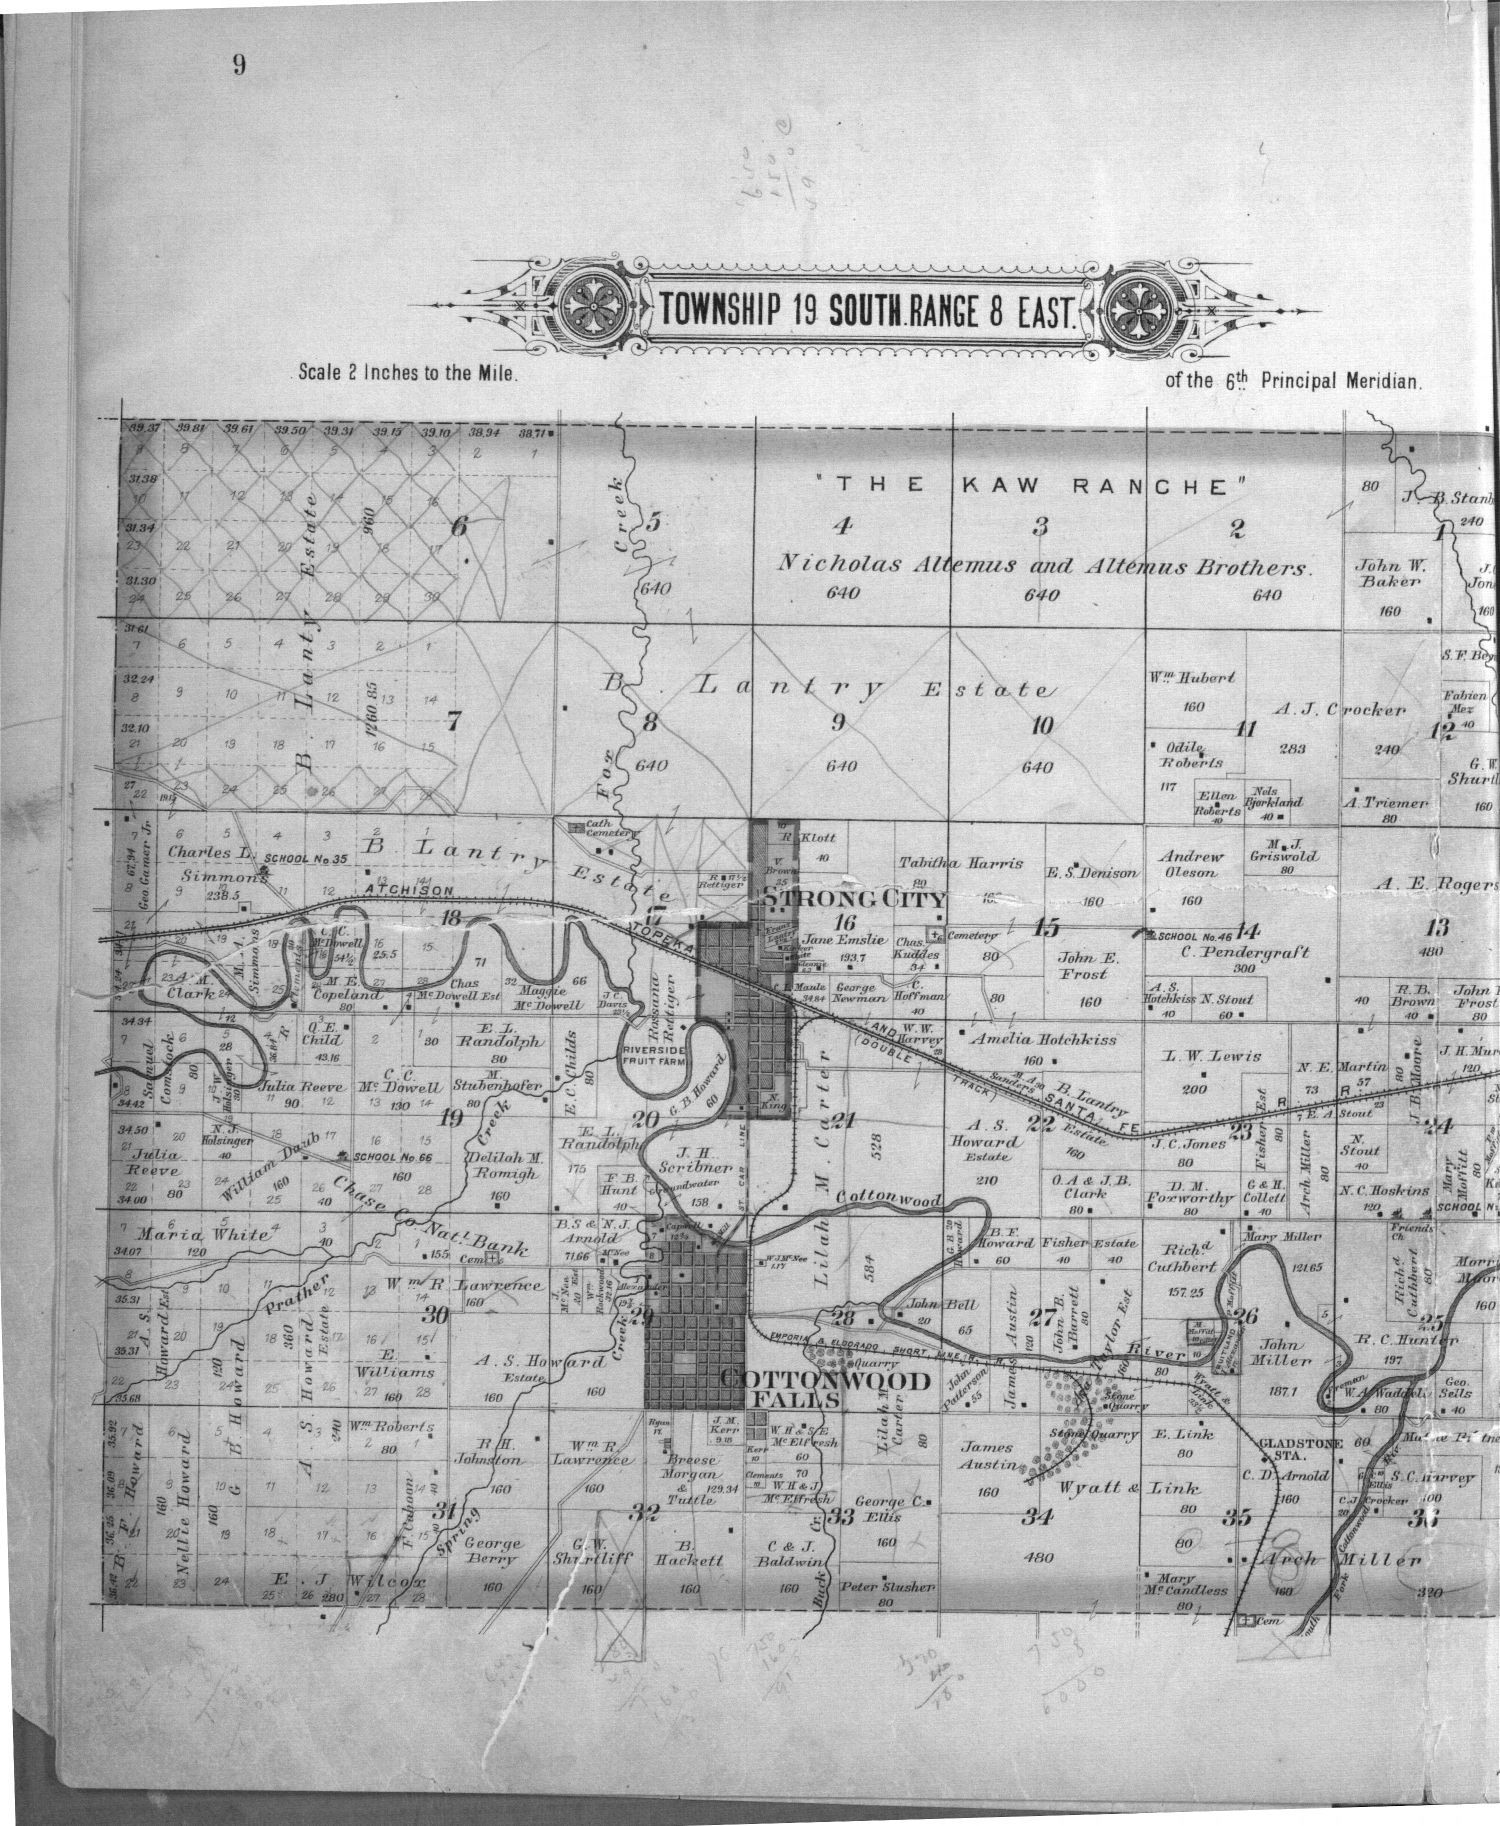 Plat book, Chase County, Kansas - 9